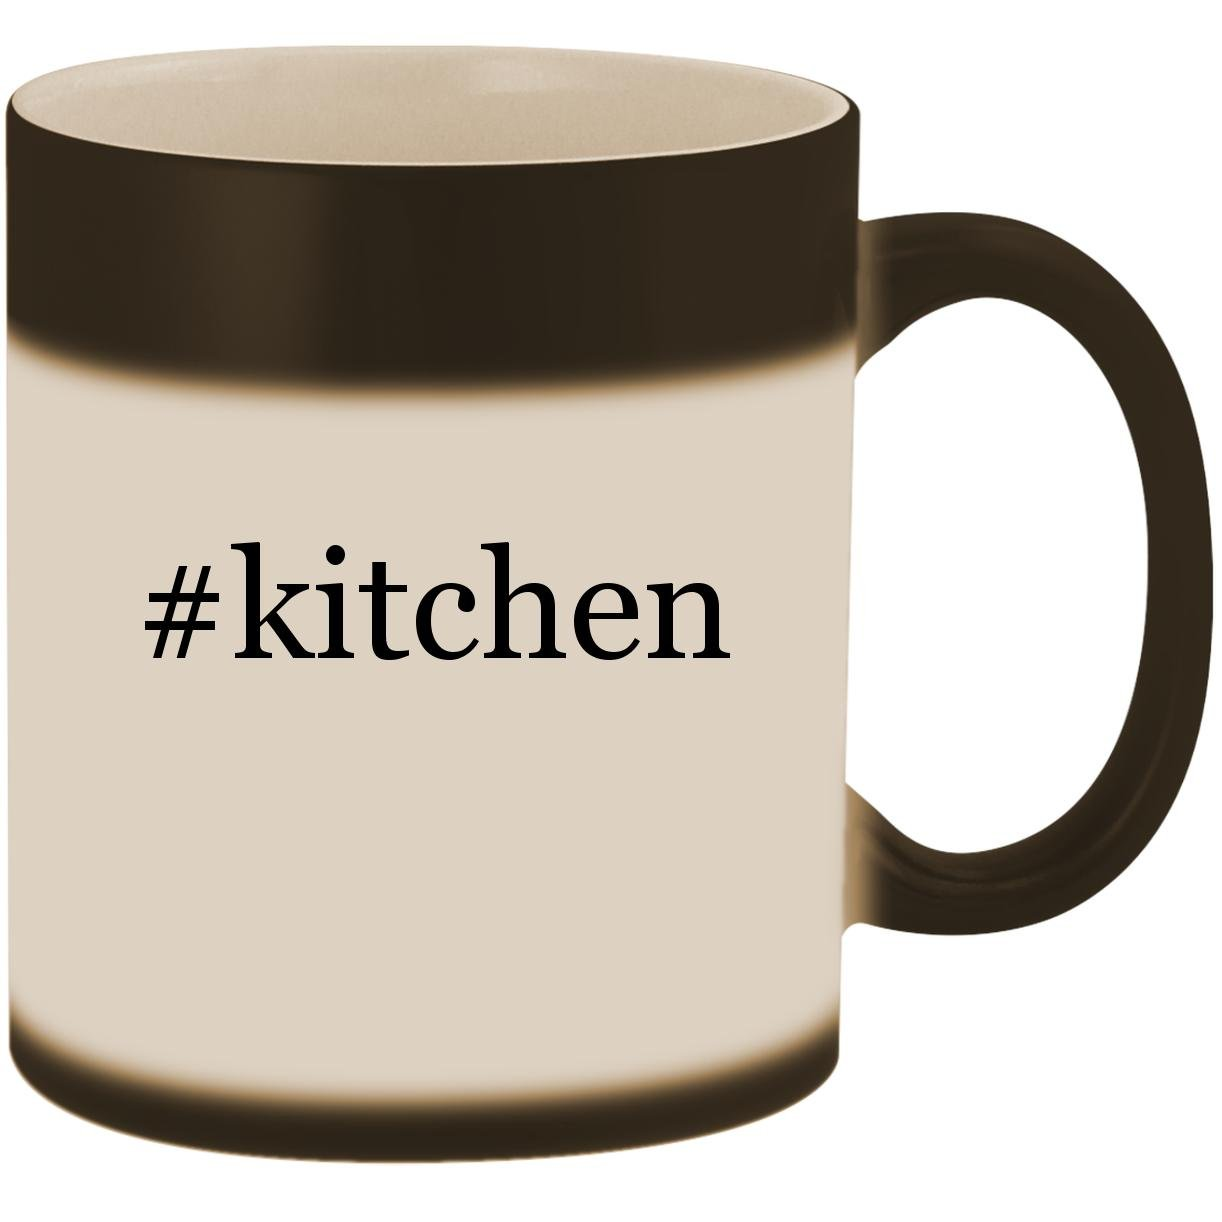 #kitchen - 11oz Ceramic Color Changing Heat Sensitive Coffee Mug Cup, Matte Black